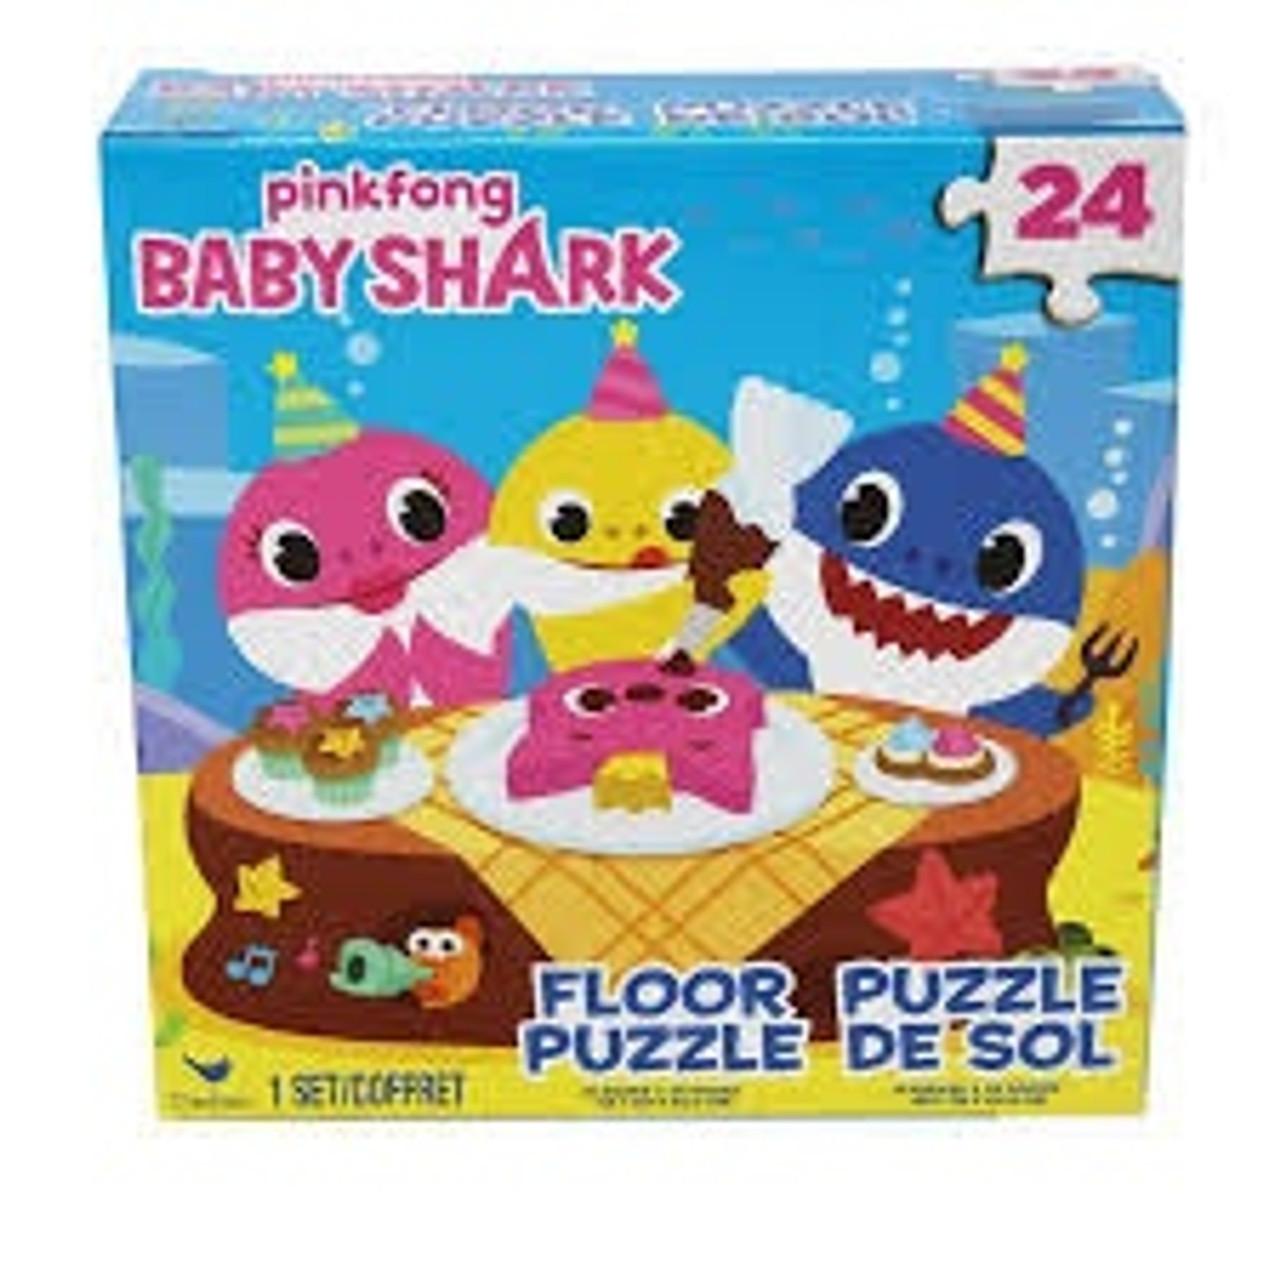 BABY SHARK 24 PC FLOOR PUZZLE